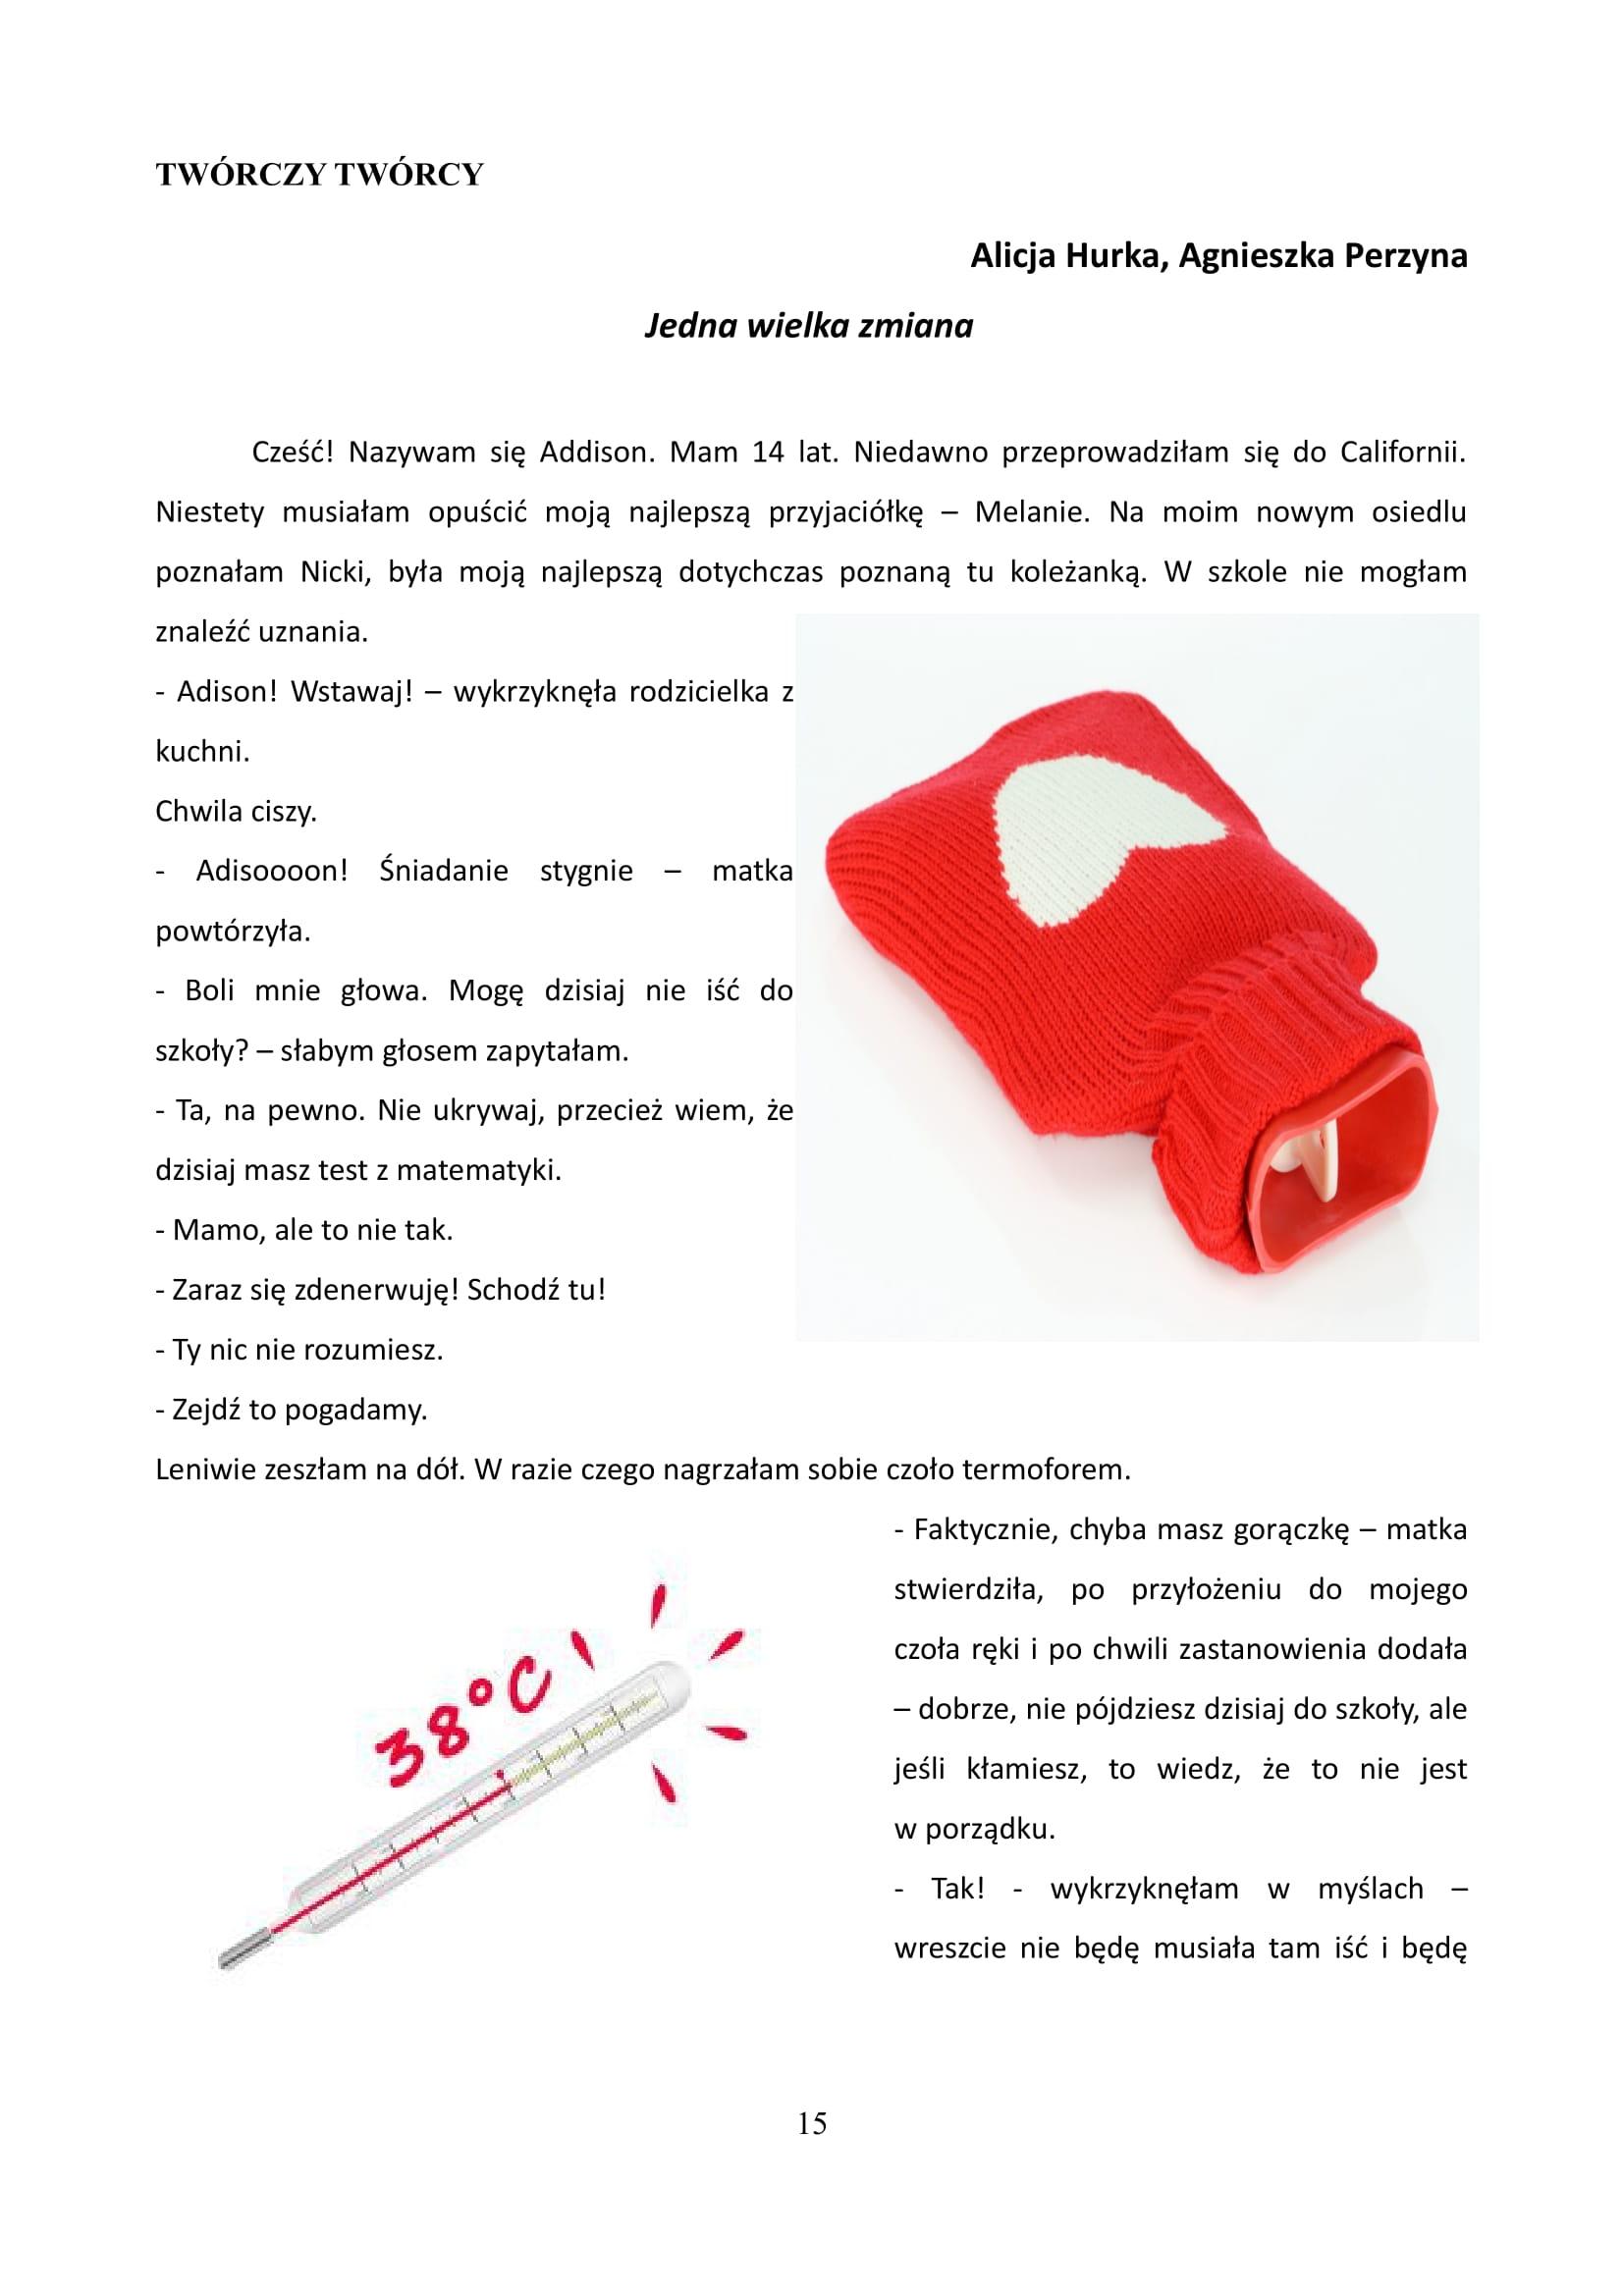 http://sp24sto.edu.pl/wp-content/uploads/sites/3/2018/02/Gazeta-4-2016.2017-15.jpg